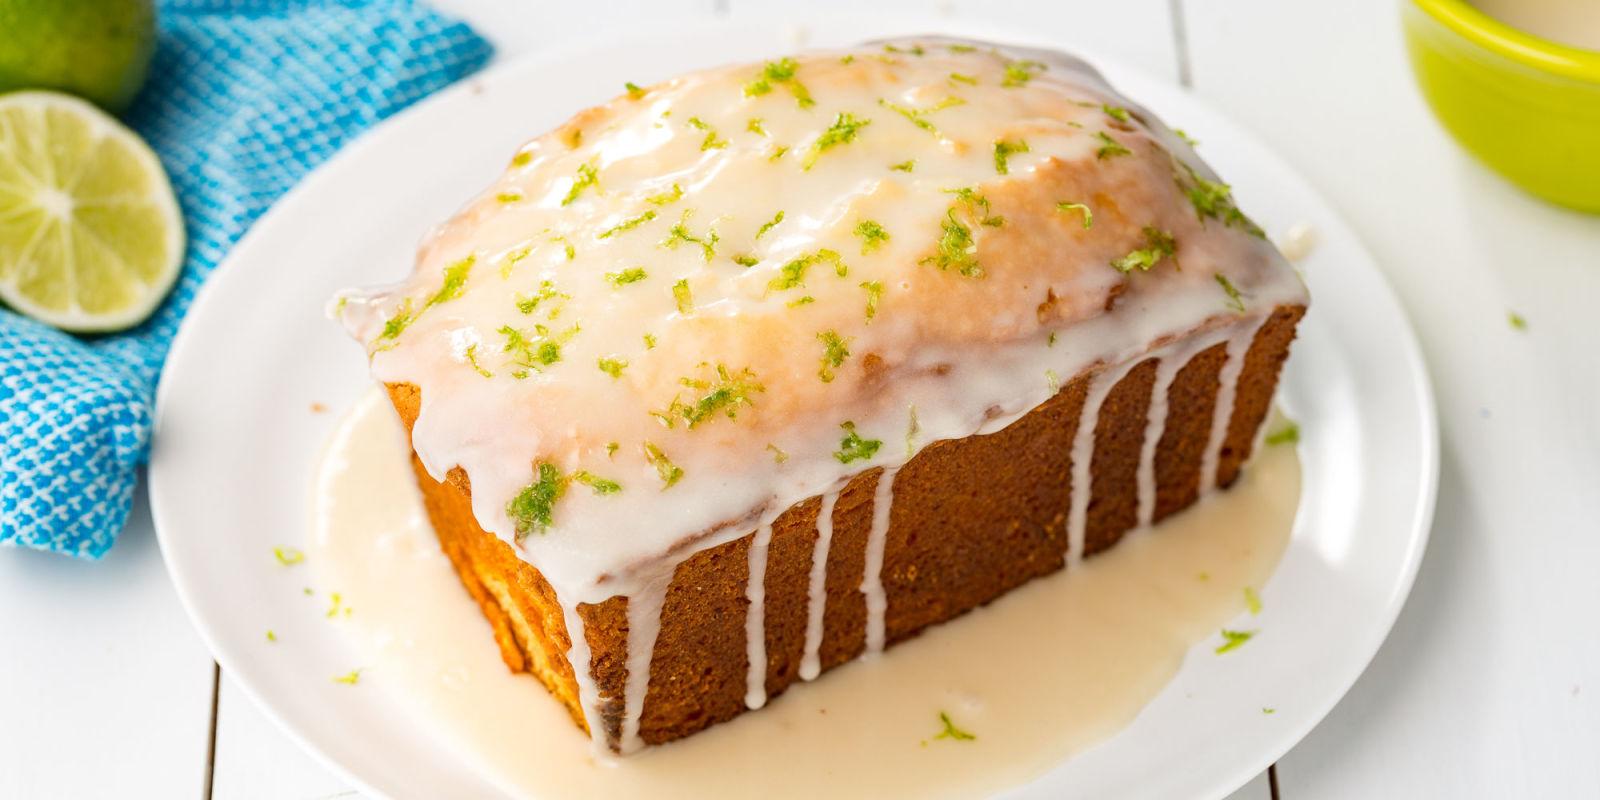 Best Key Lime Pound Cake Recipe - How To Make Pound Cake - Delish.com